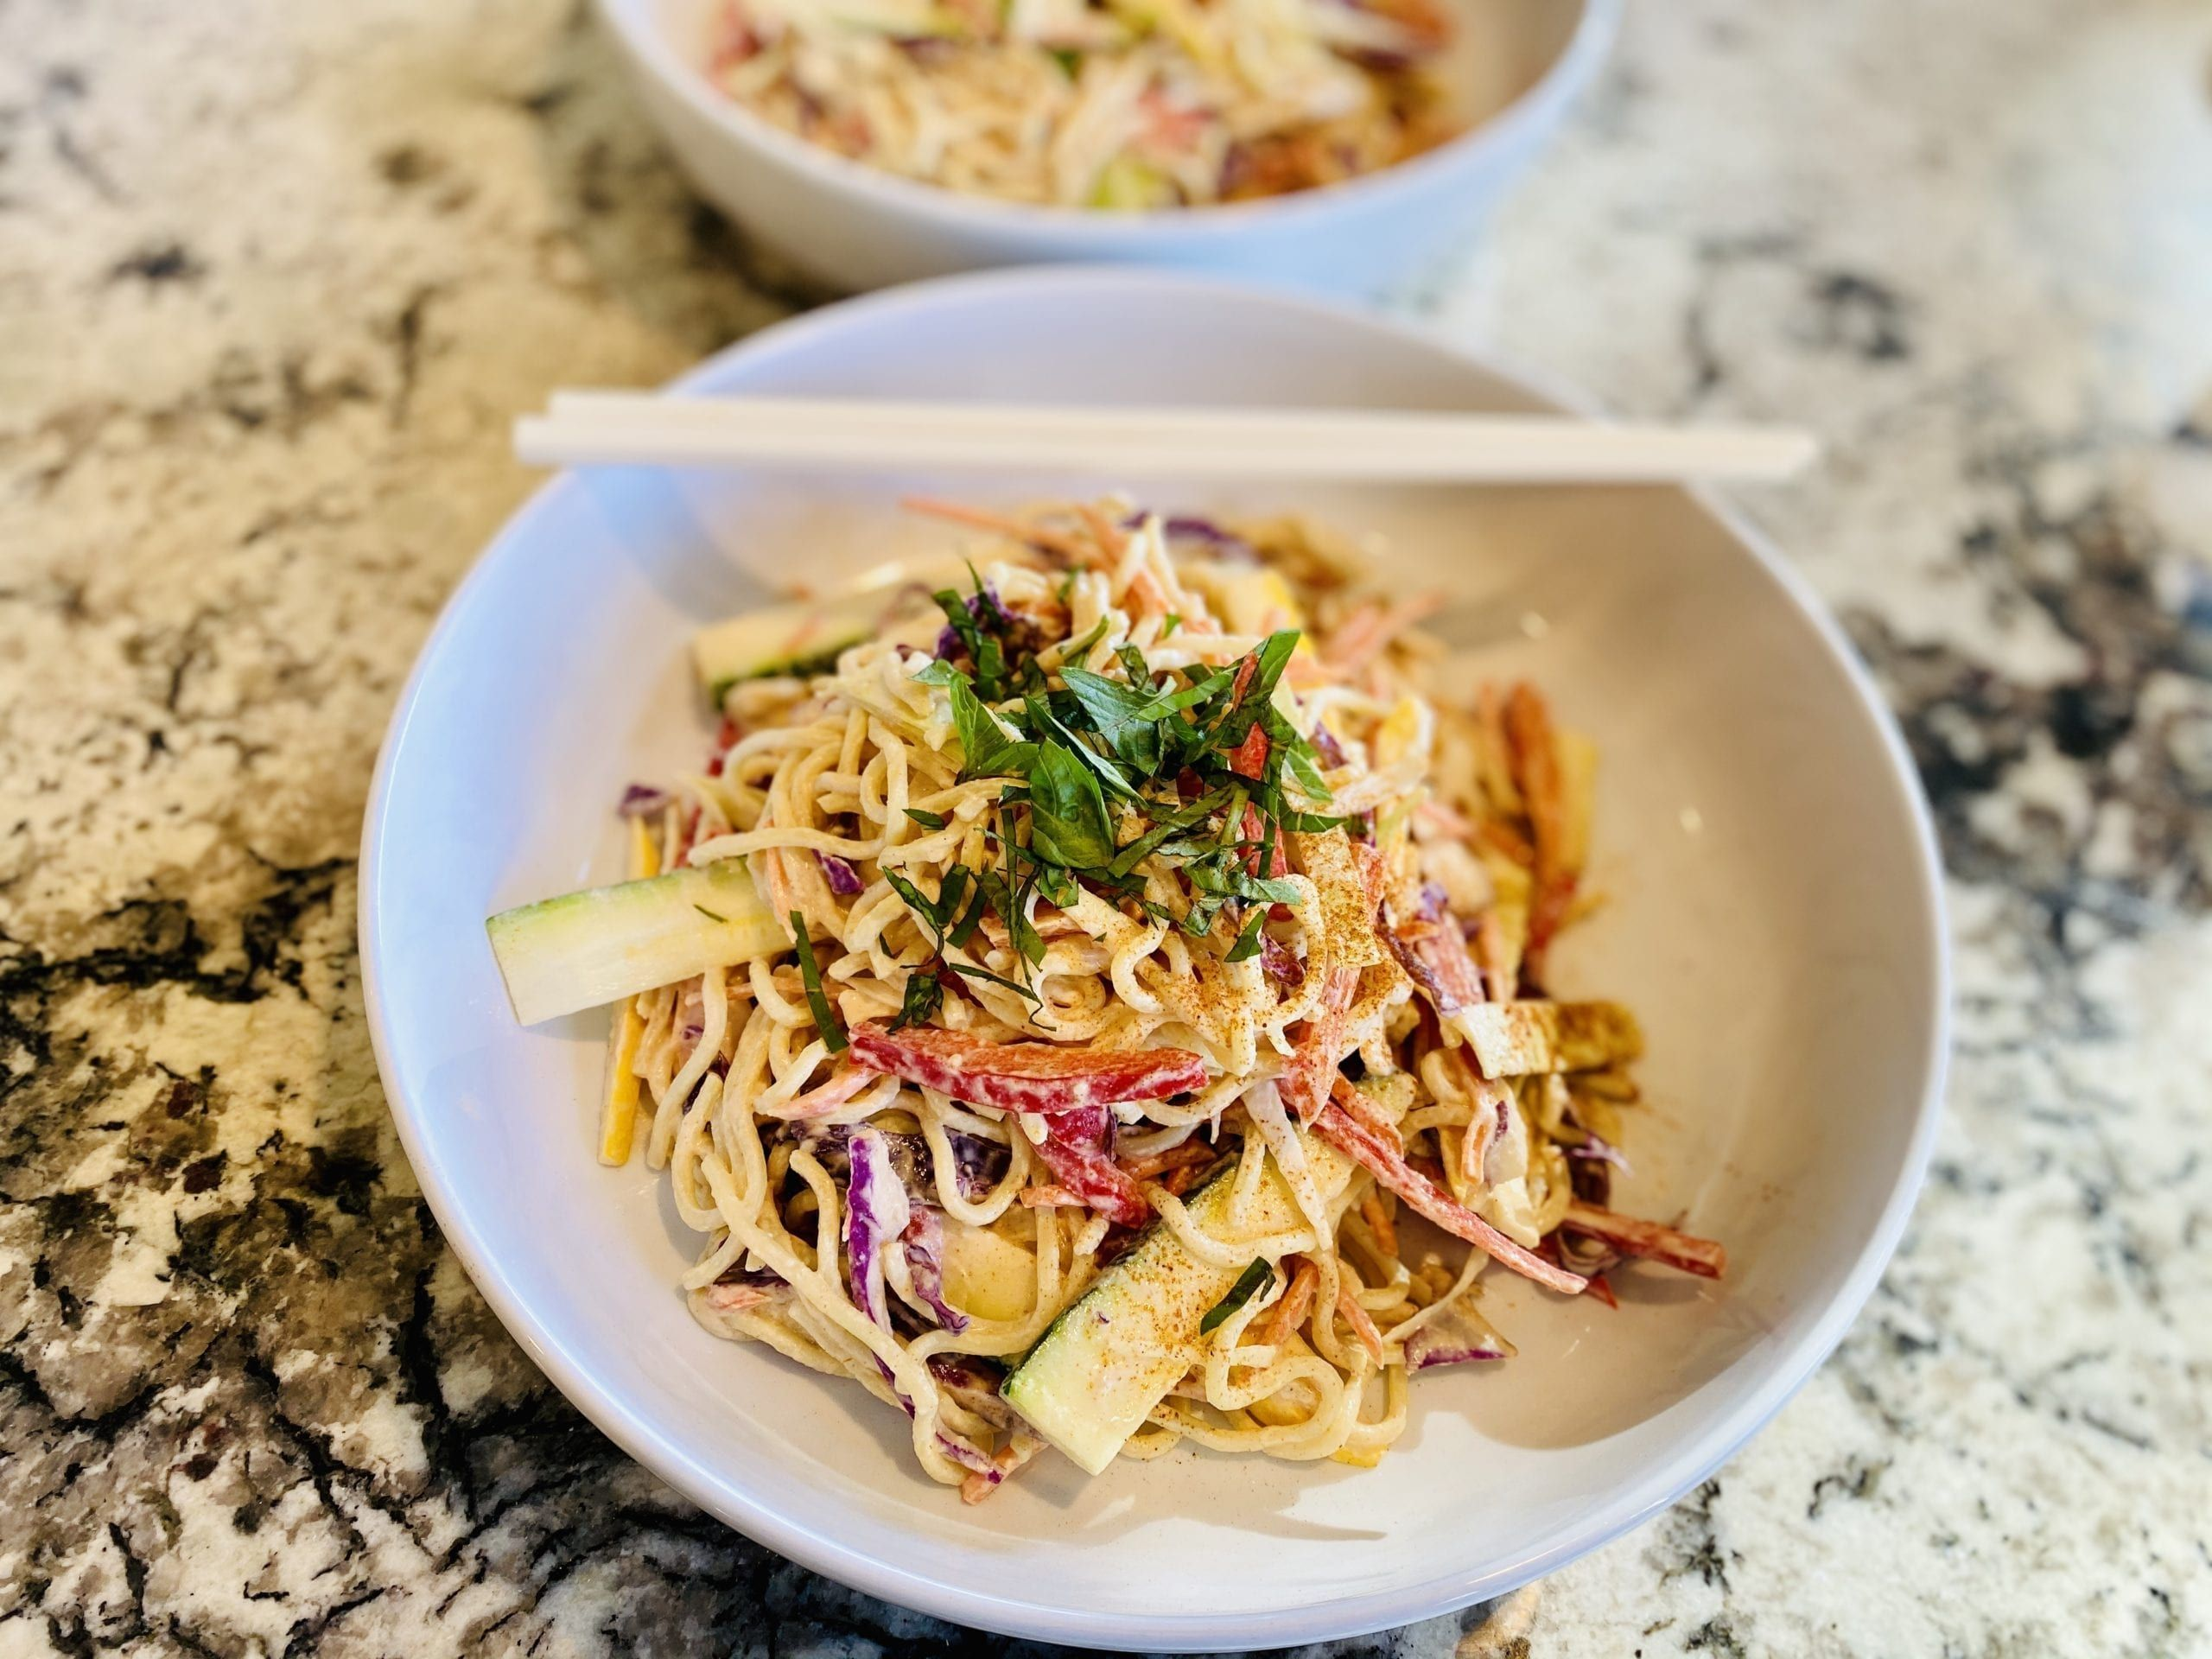 Yum Yum Noodles Yum Yum Noodles Recipe Kathys Vegan Kitchen Recipe Yum Yum Sauce Vegan Dinner Recipes Easy Vegan Kitchen